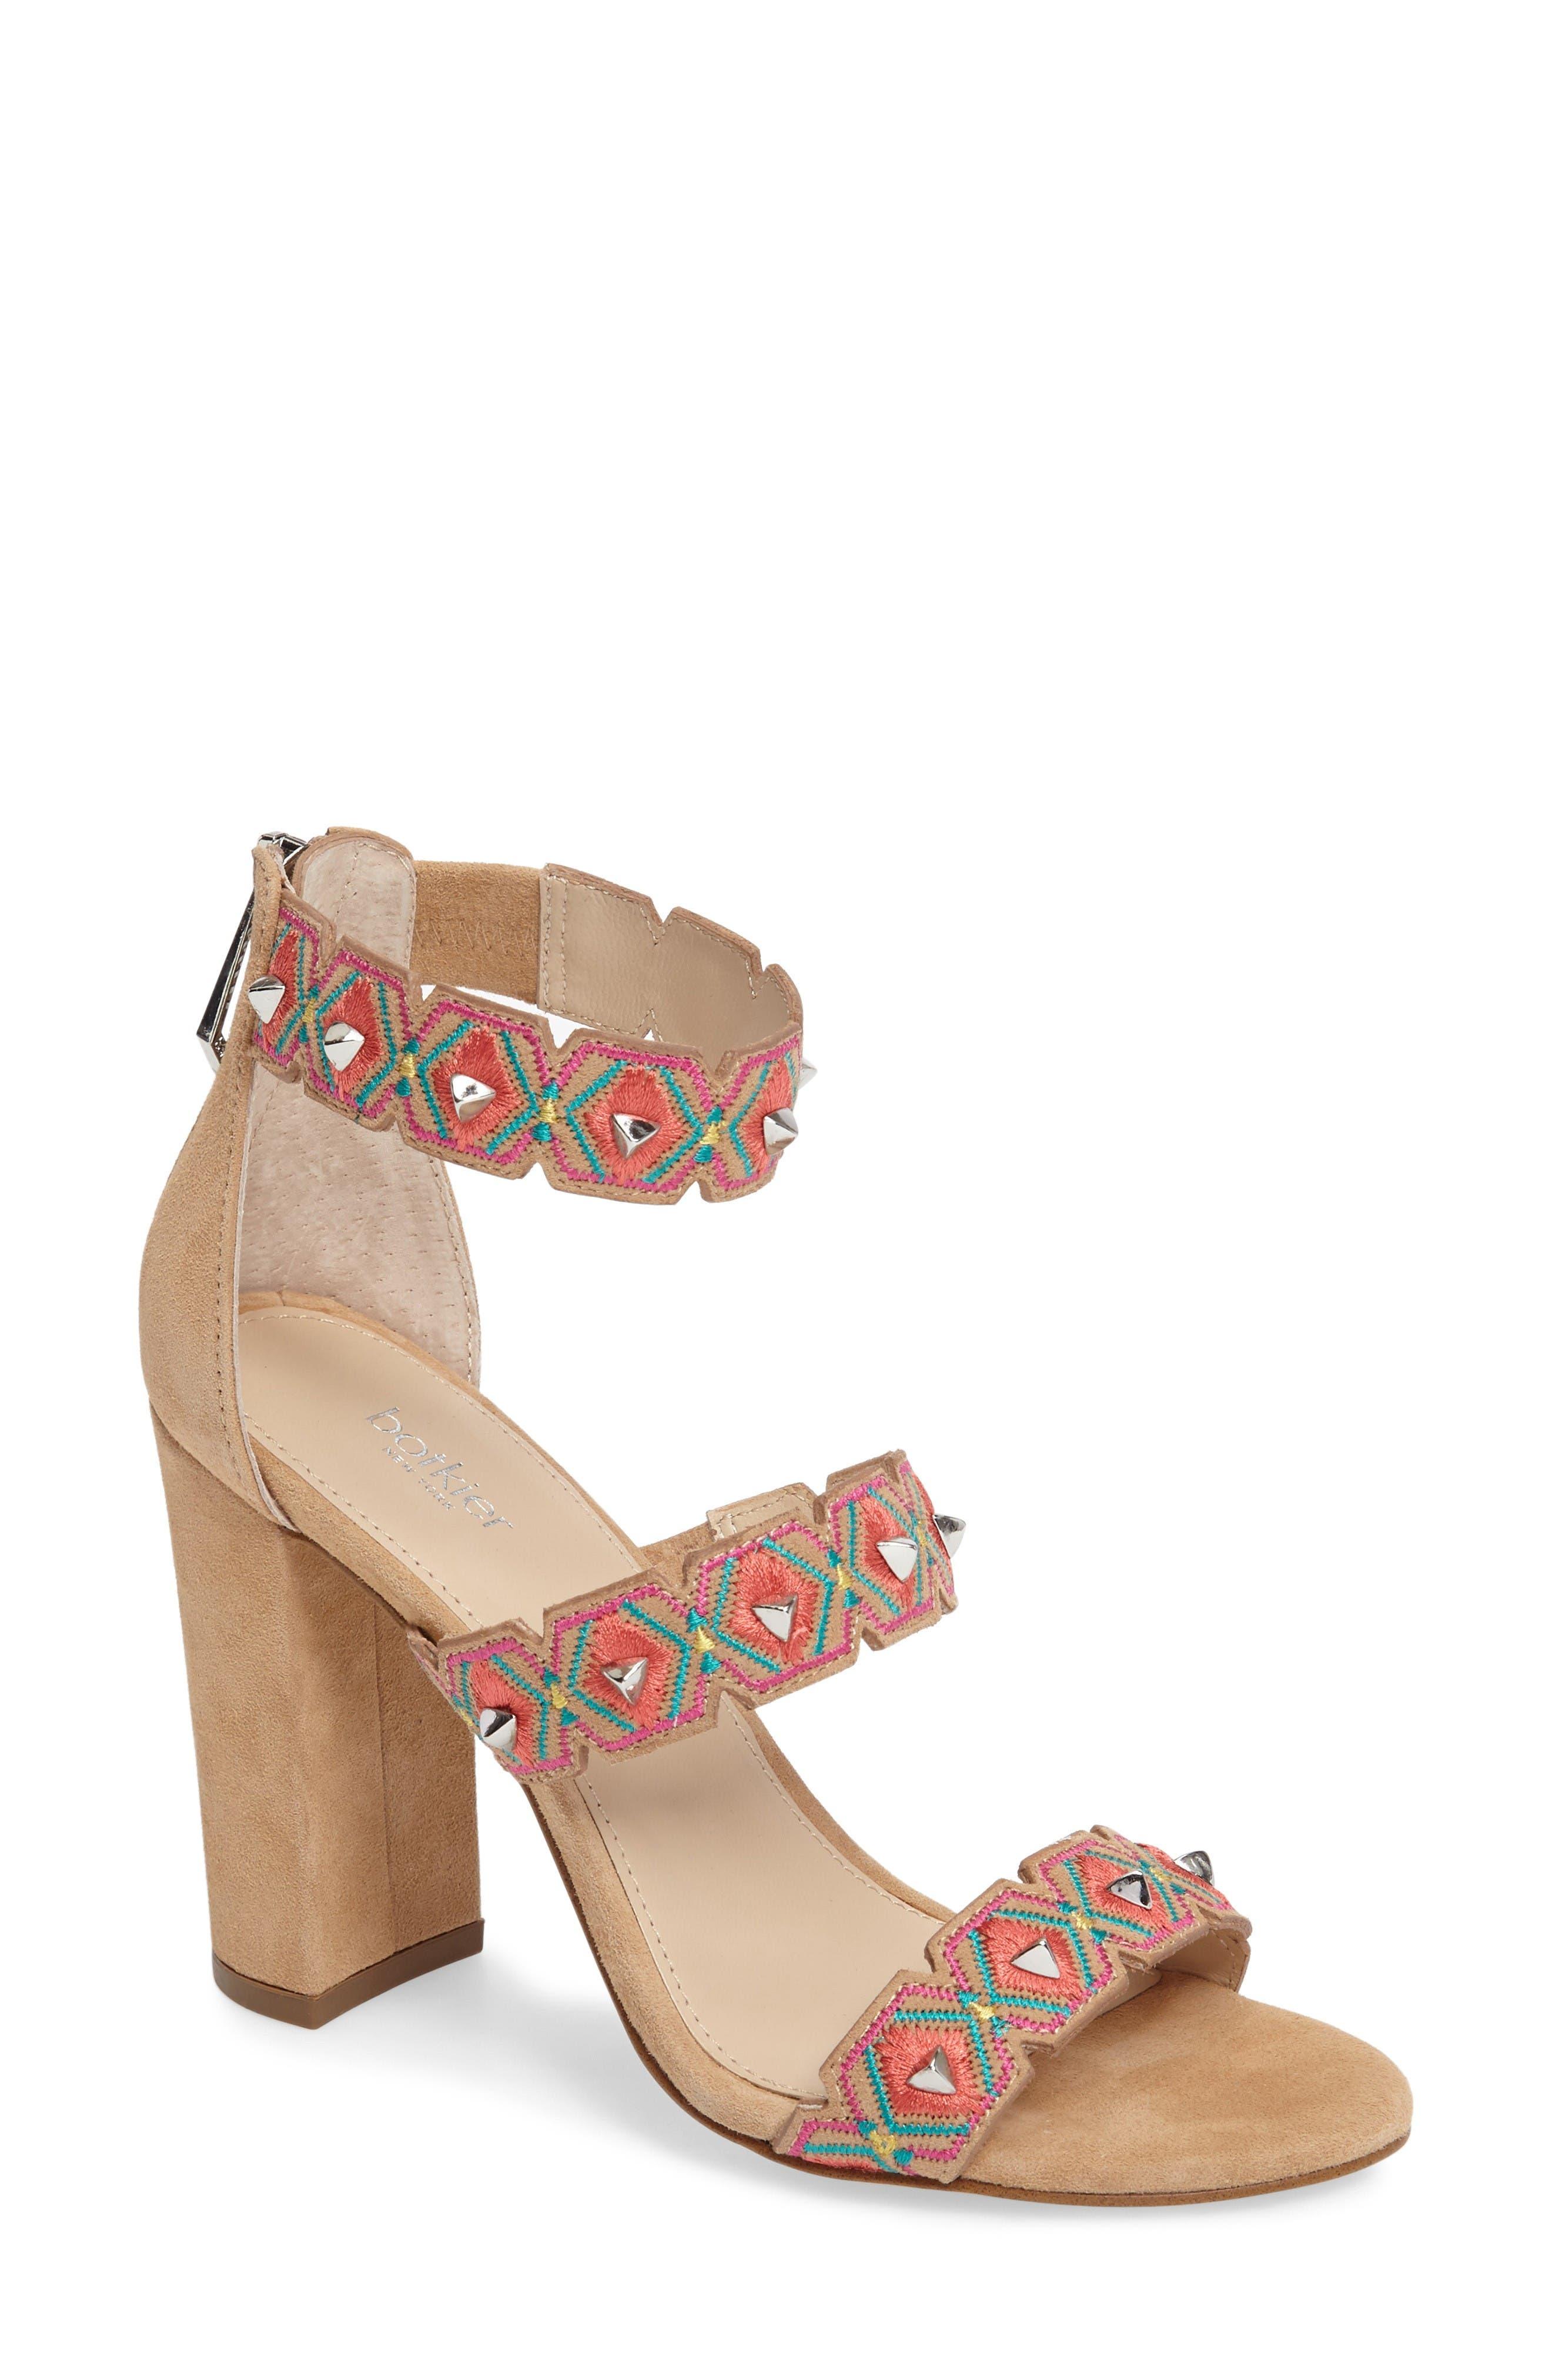 Alternate Image 1 Selected - Botkier Gigi Embellished Sandal (Women)